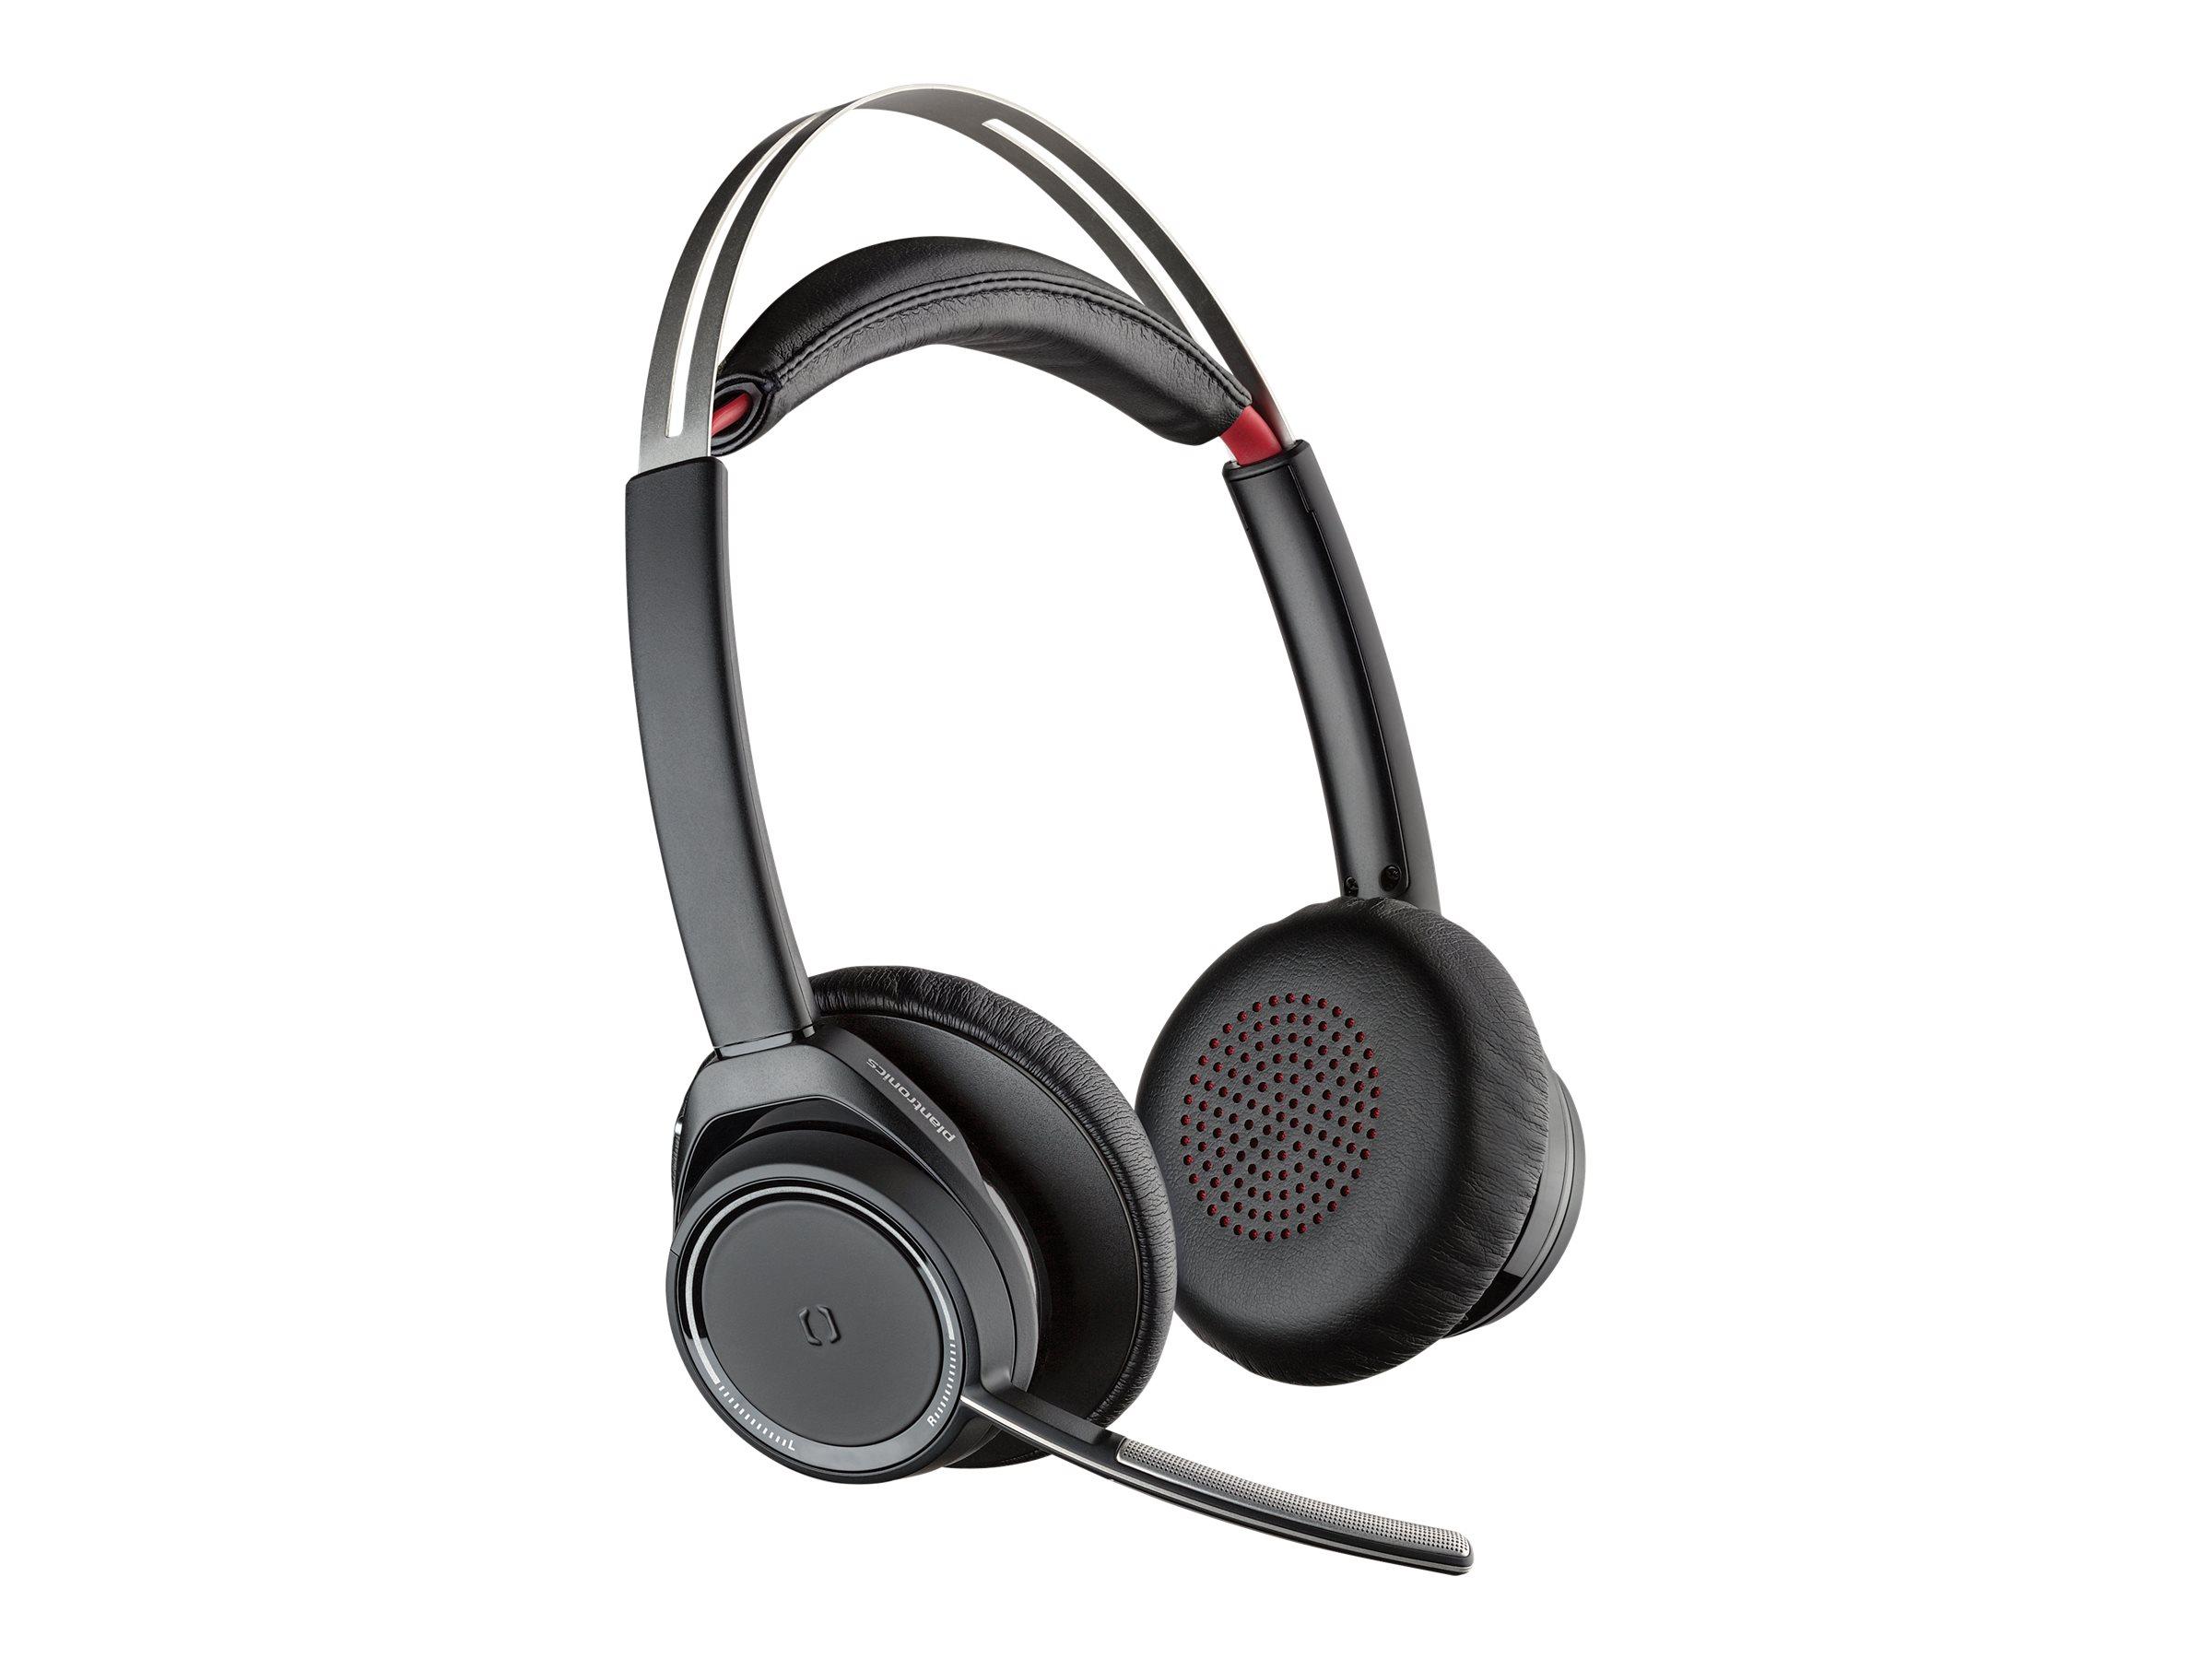 Poly - Plantronics Voyager Focus UC B825 - Kein Ladegerät - Headset - On-Ear - Bluetooth